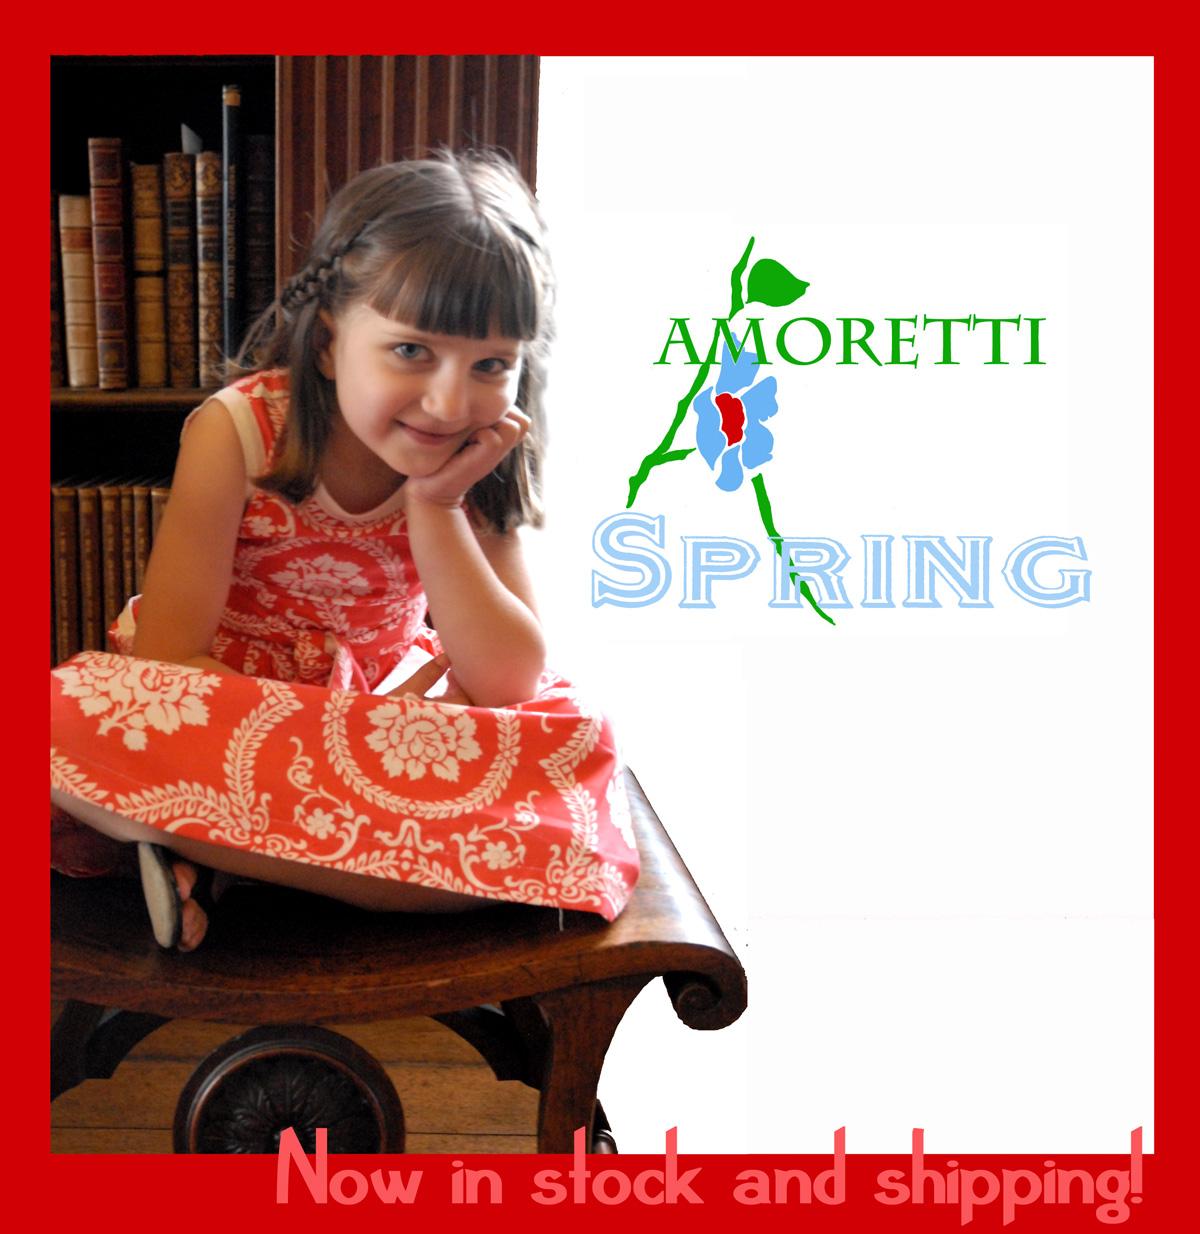 amoretti-spring.JPG